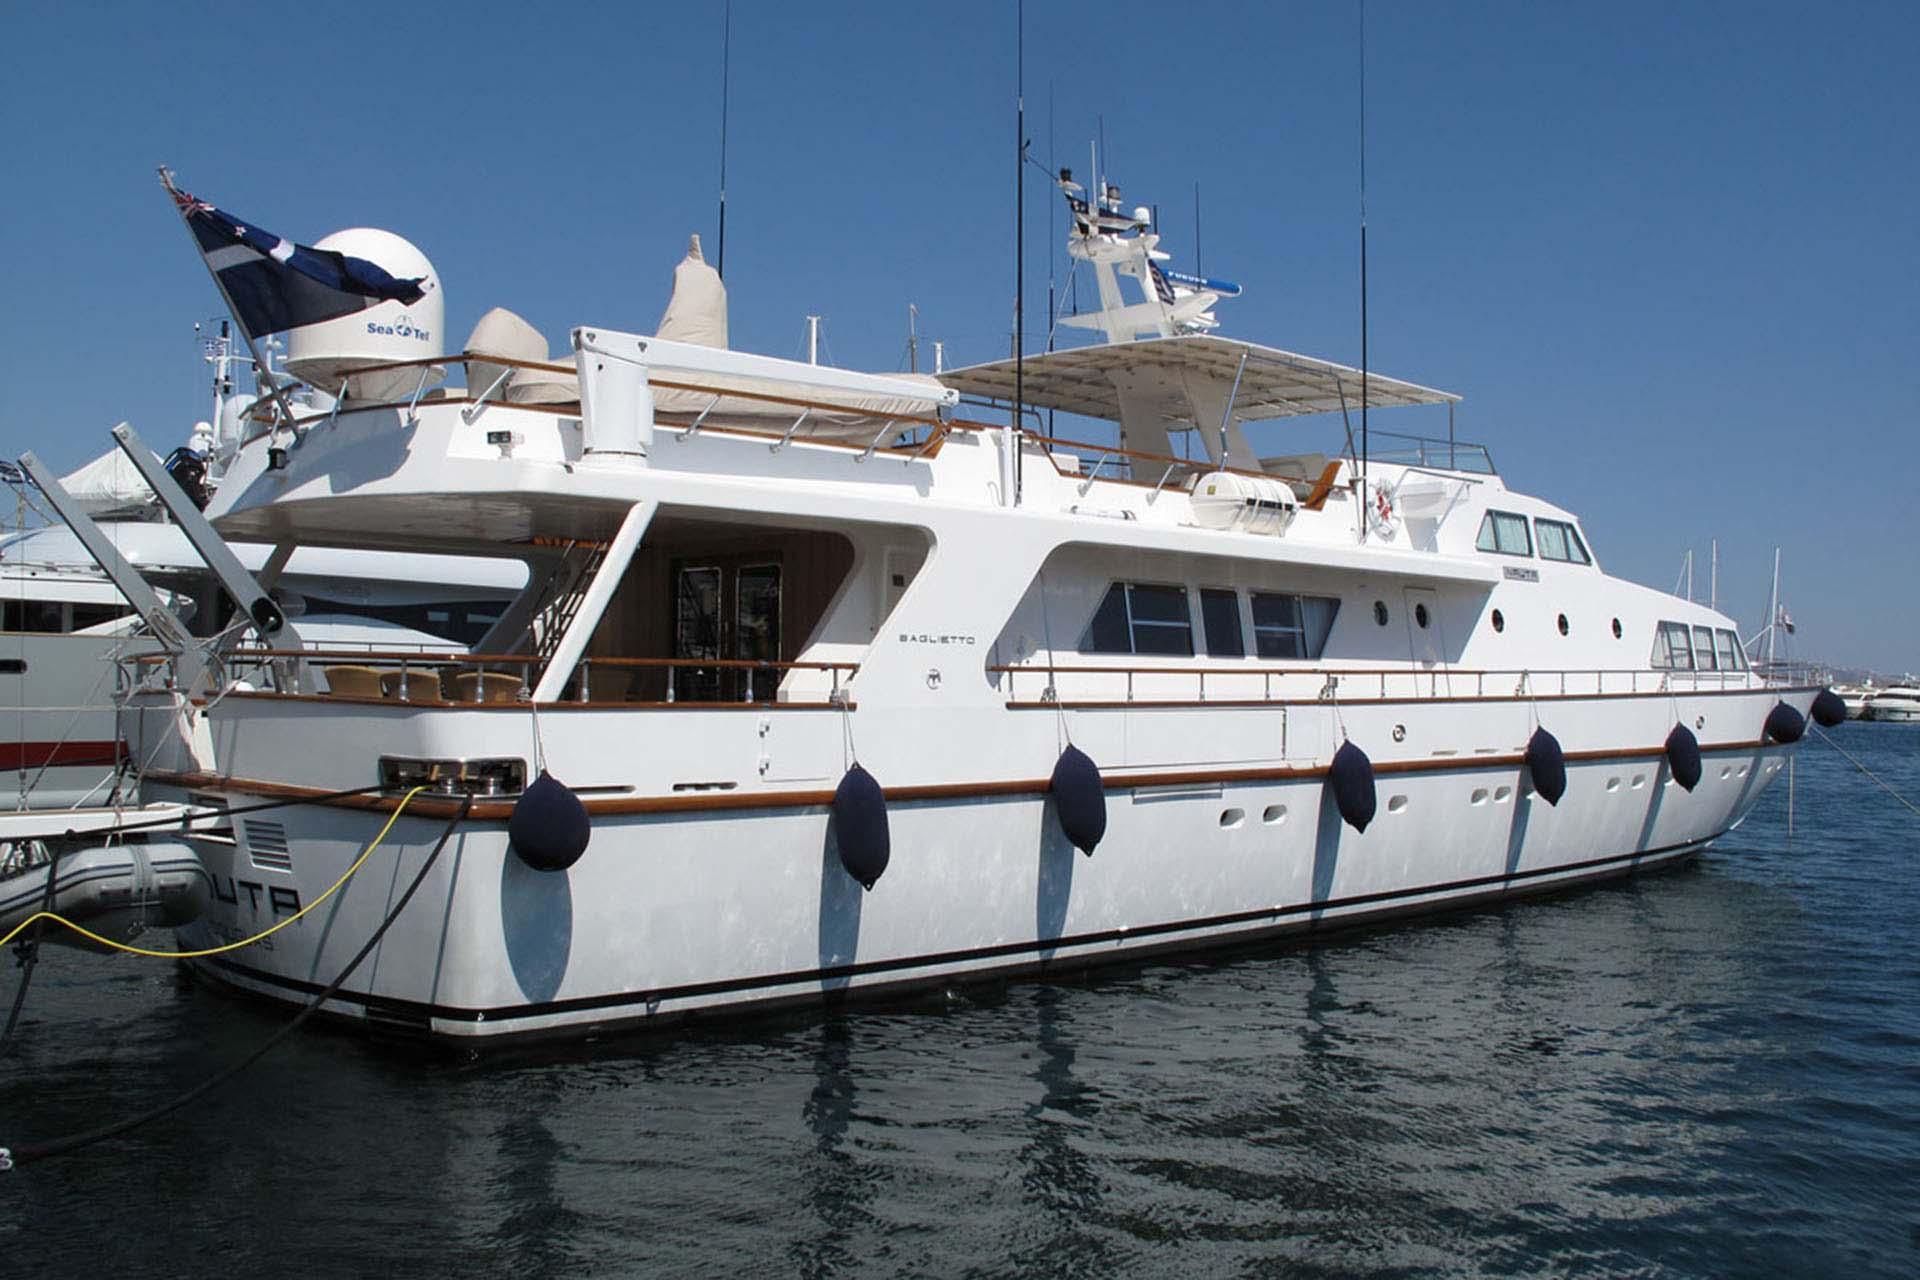 baglietto - NAUTA - Paskowsky Yacht Design